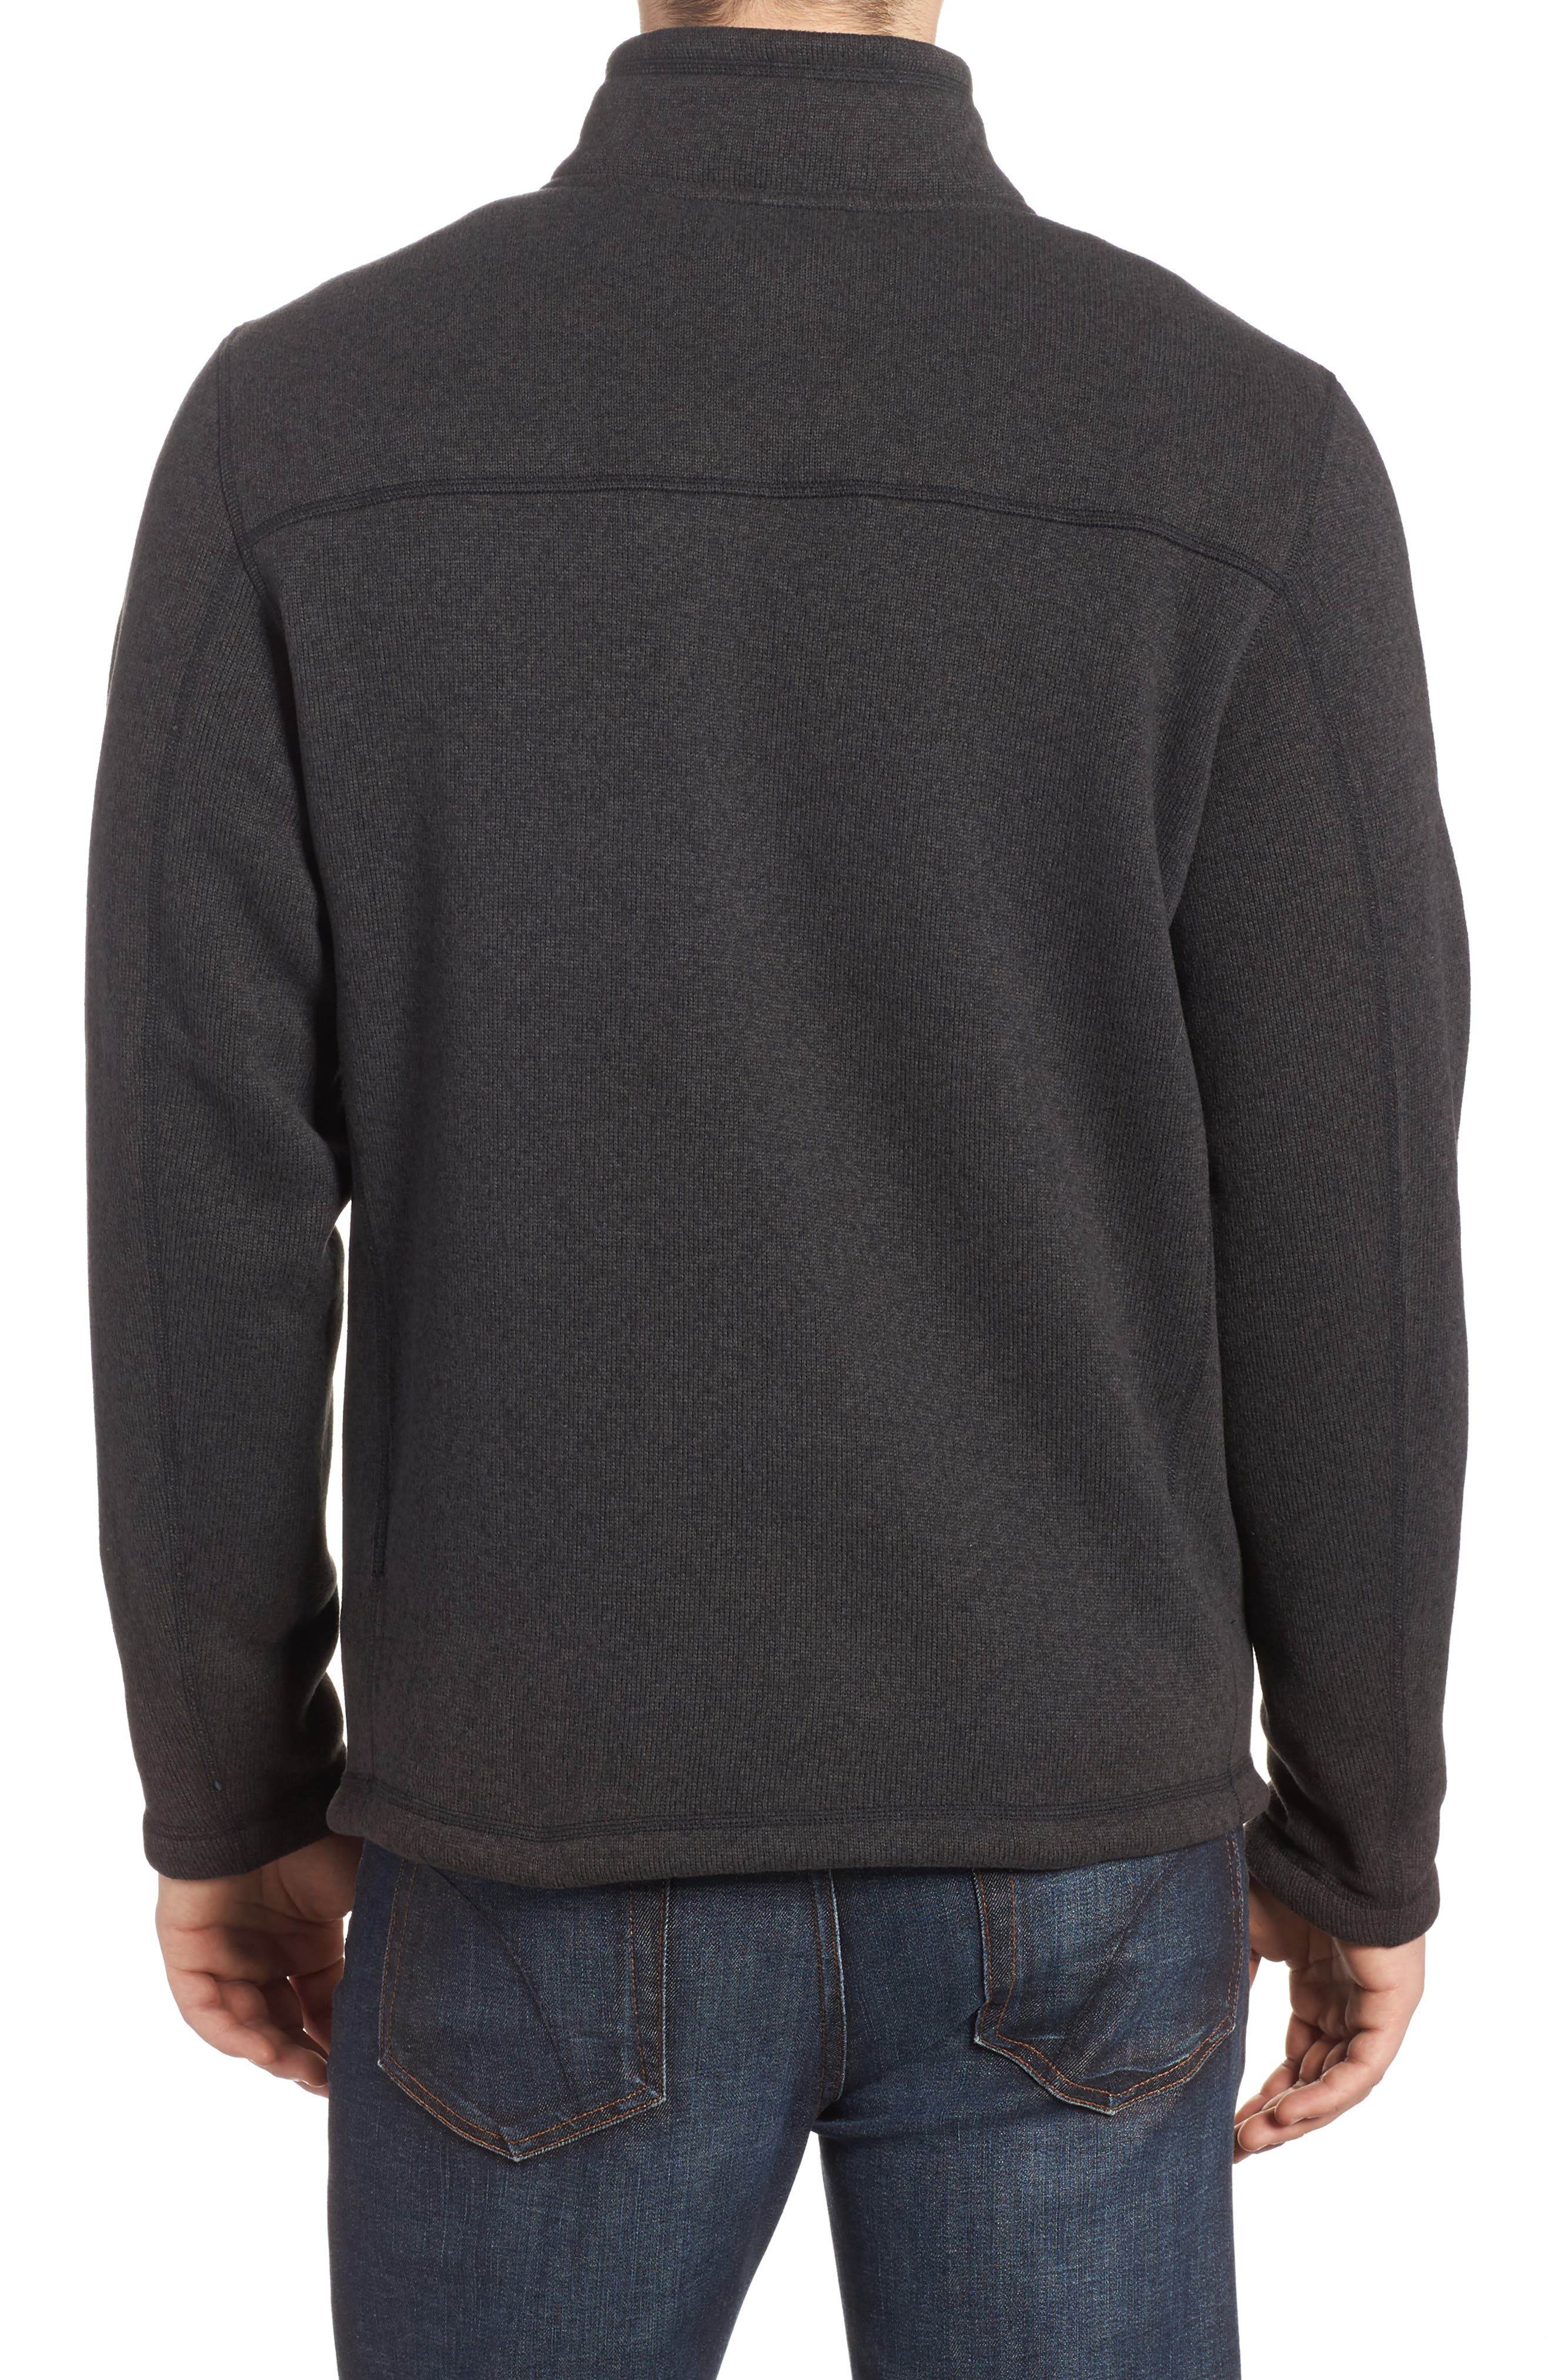 THE NORTH FACE, Gordon Lyons Quarter-Zip Fleece Jacket, Alternate thumbnail 2, color, 001